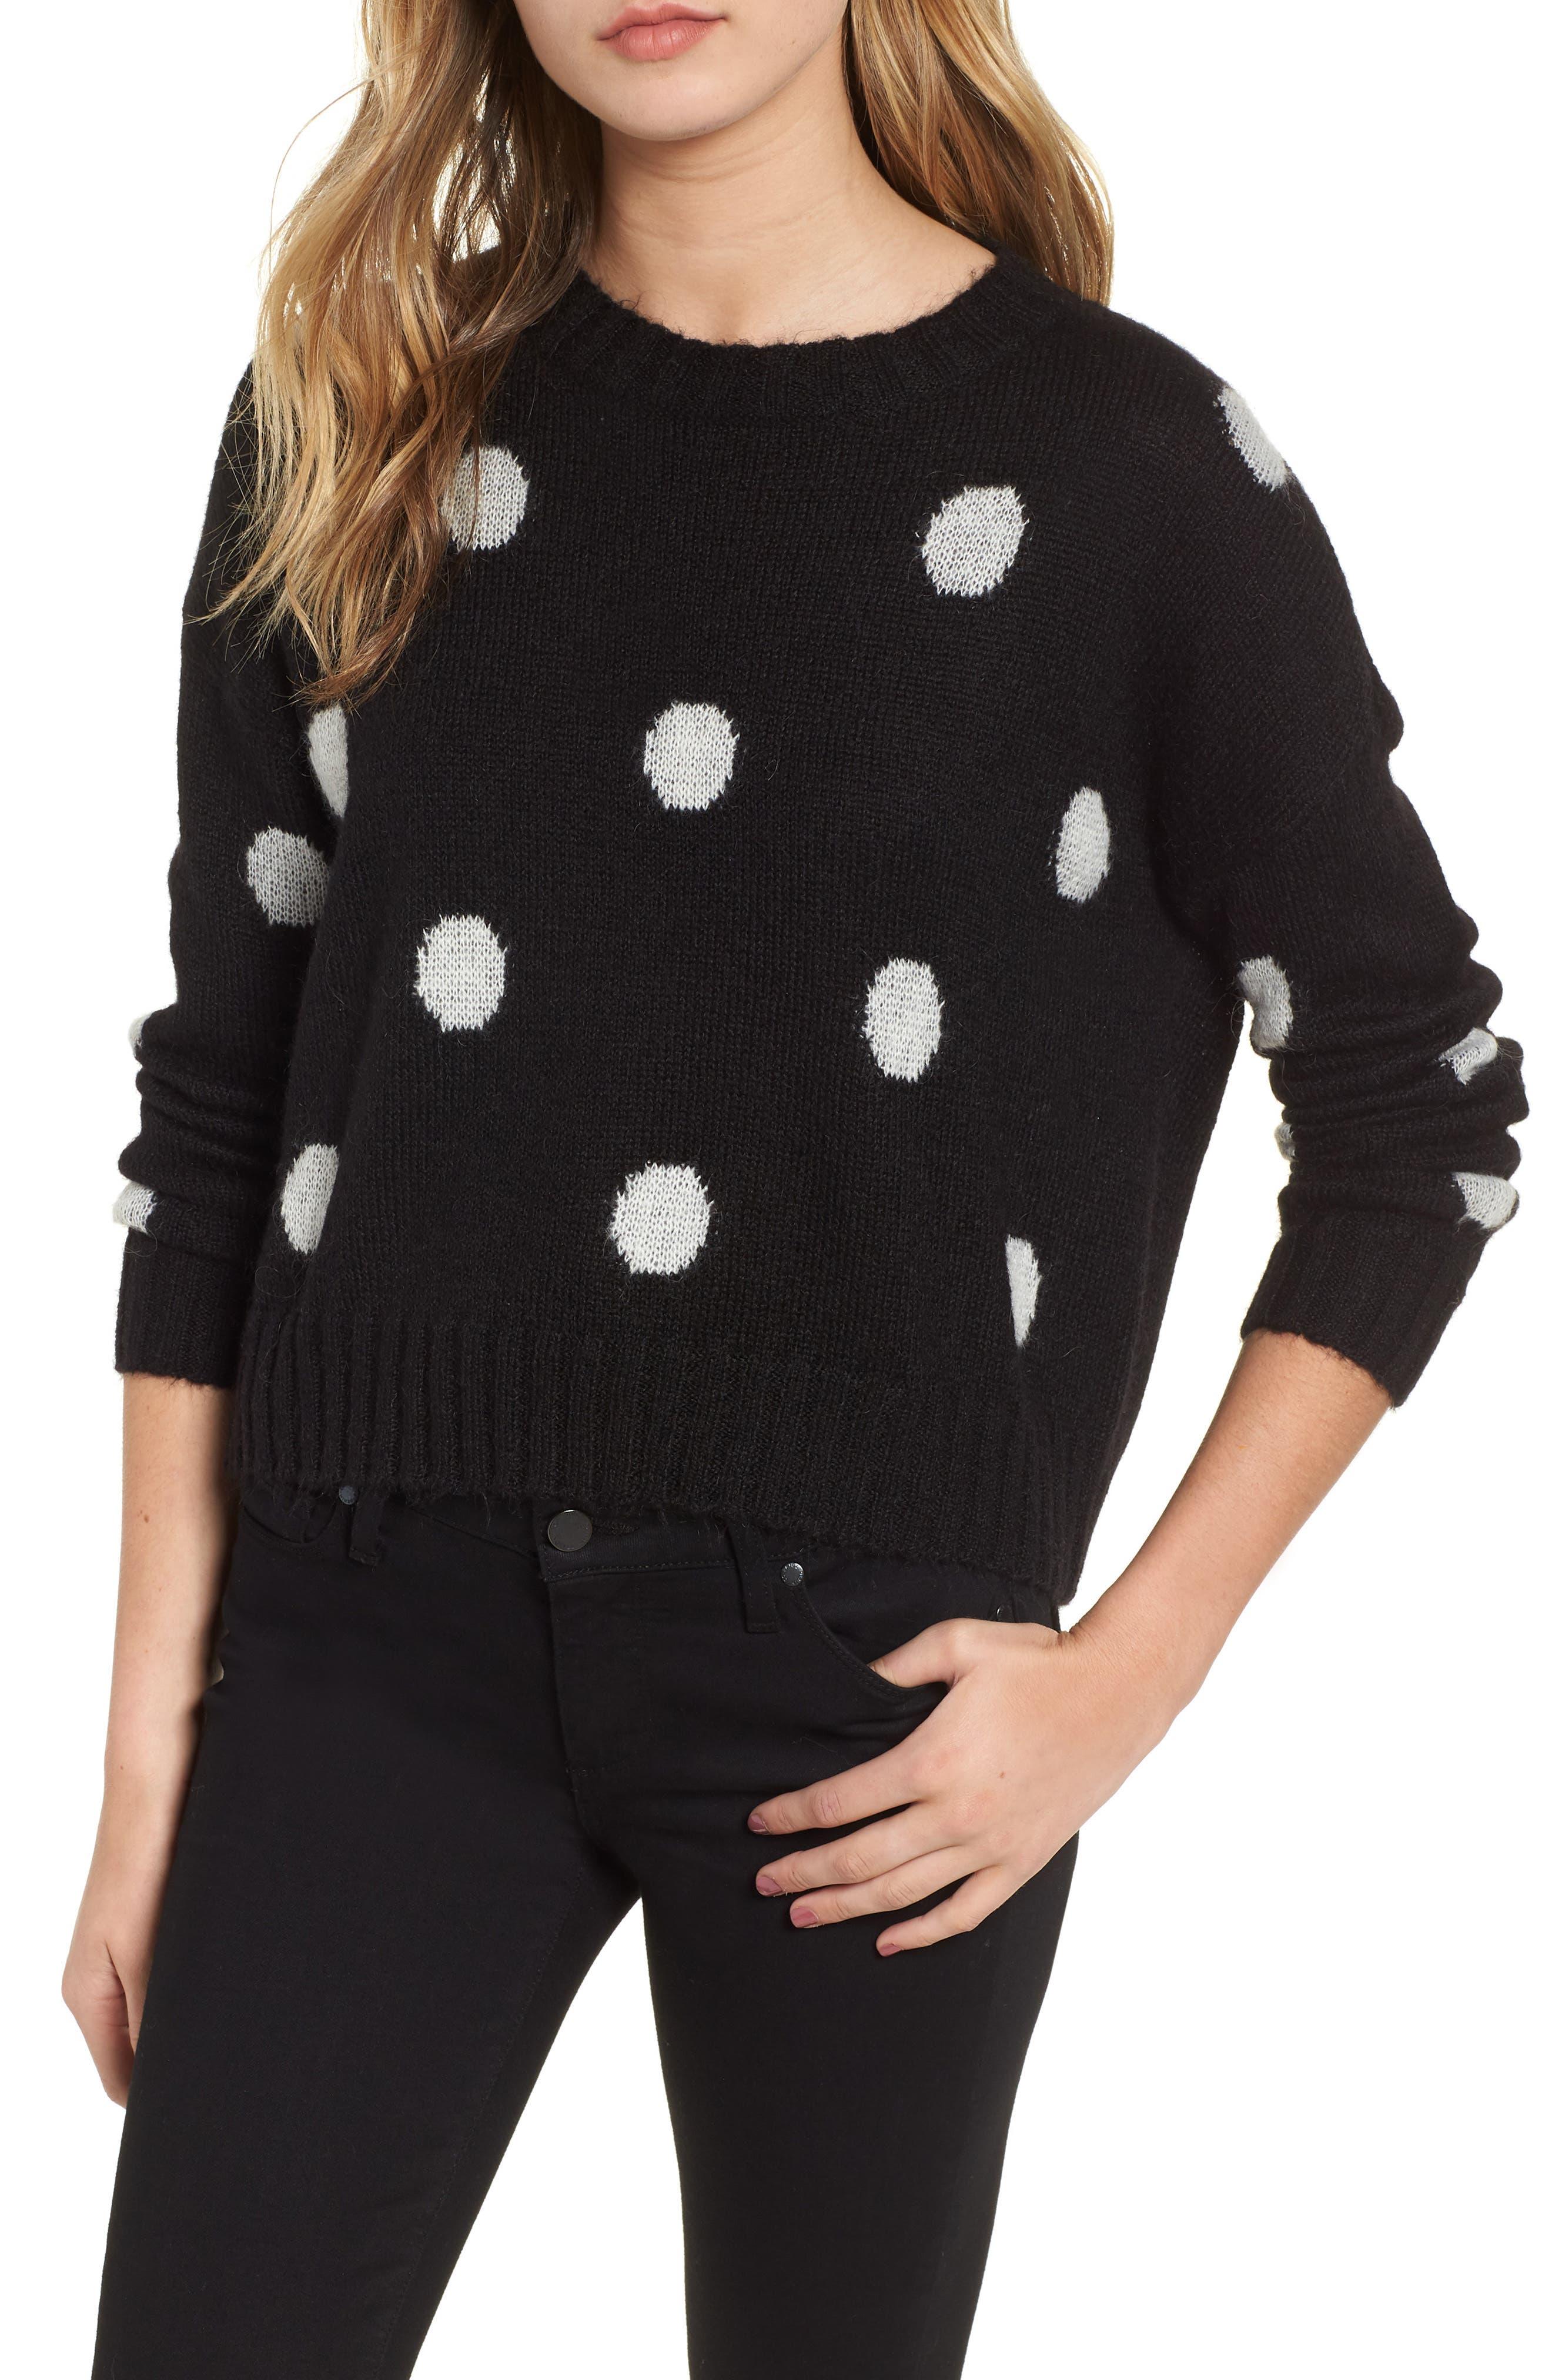 Perci Sweater,                             Main thumbnail 1, color,                             BLACK/ IVORY POLKA DOT